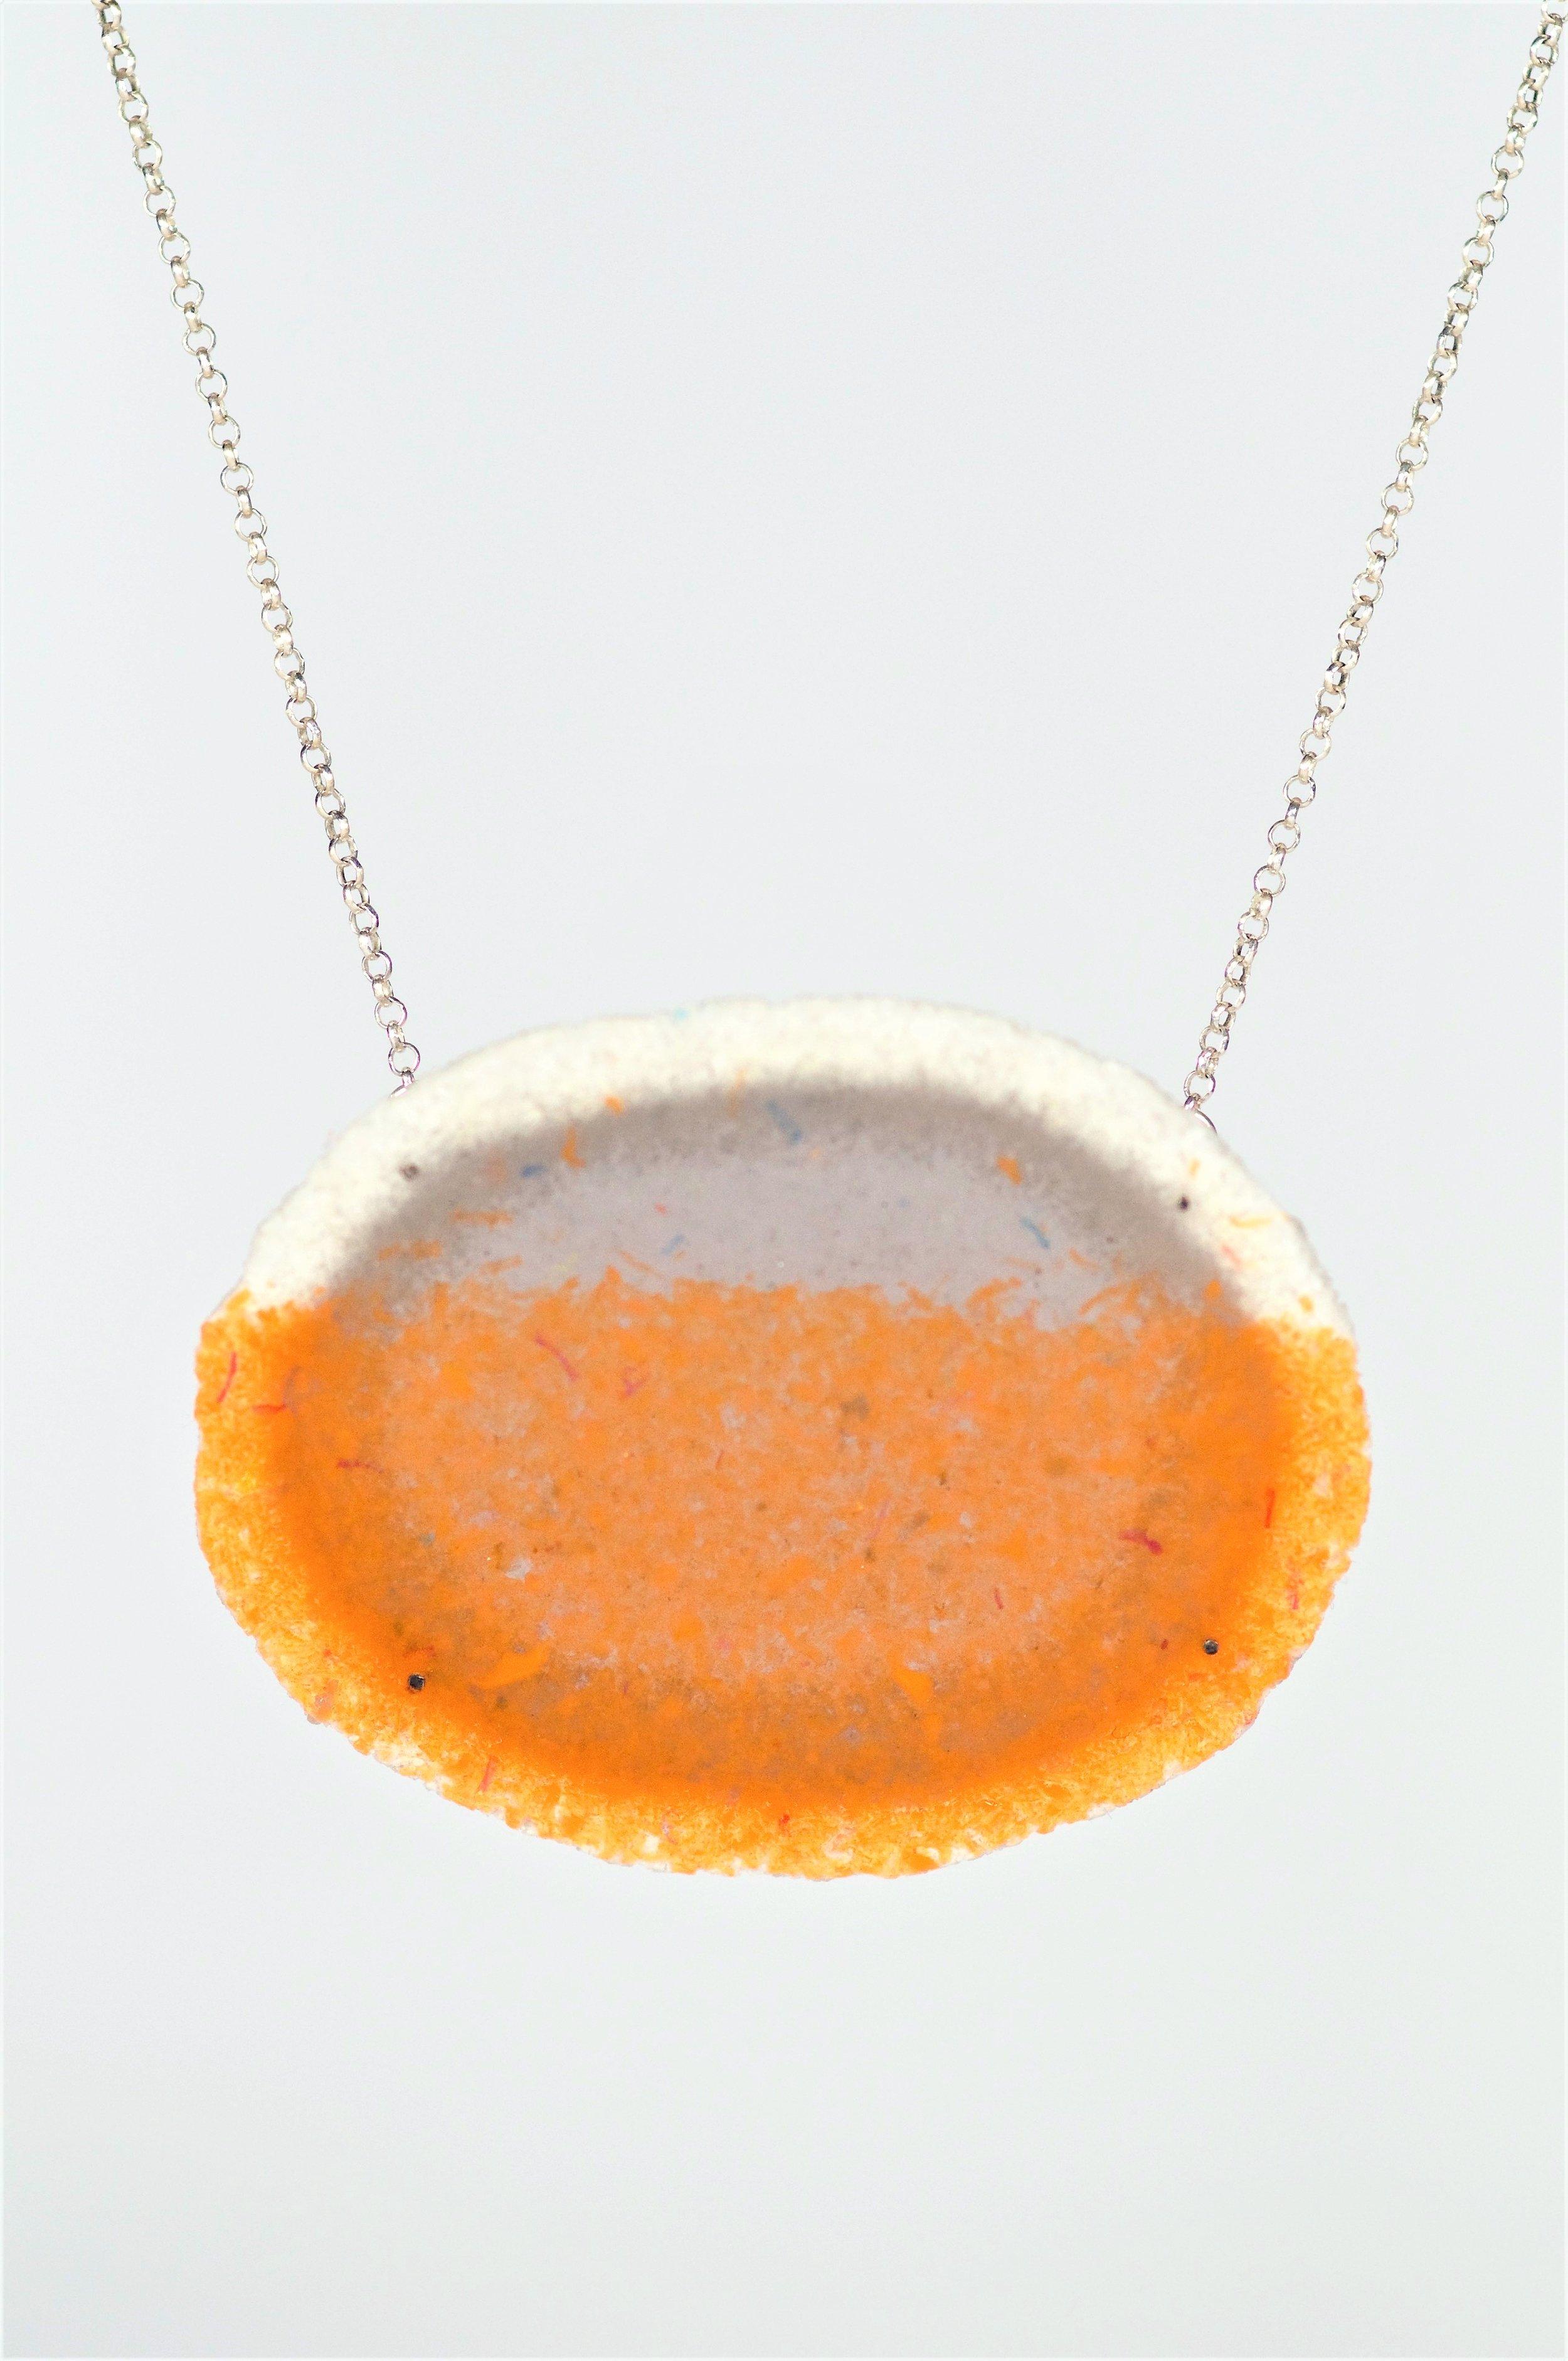 sarah lindsay Dust-pend-grey_orange-1 copy.jpg